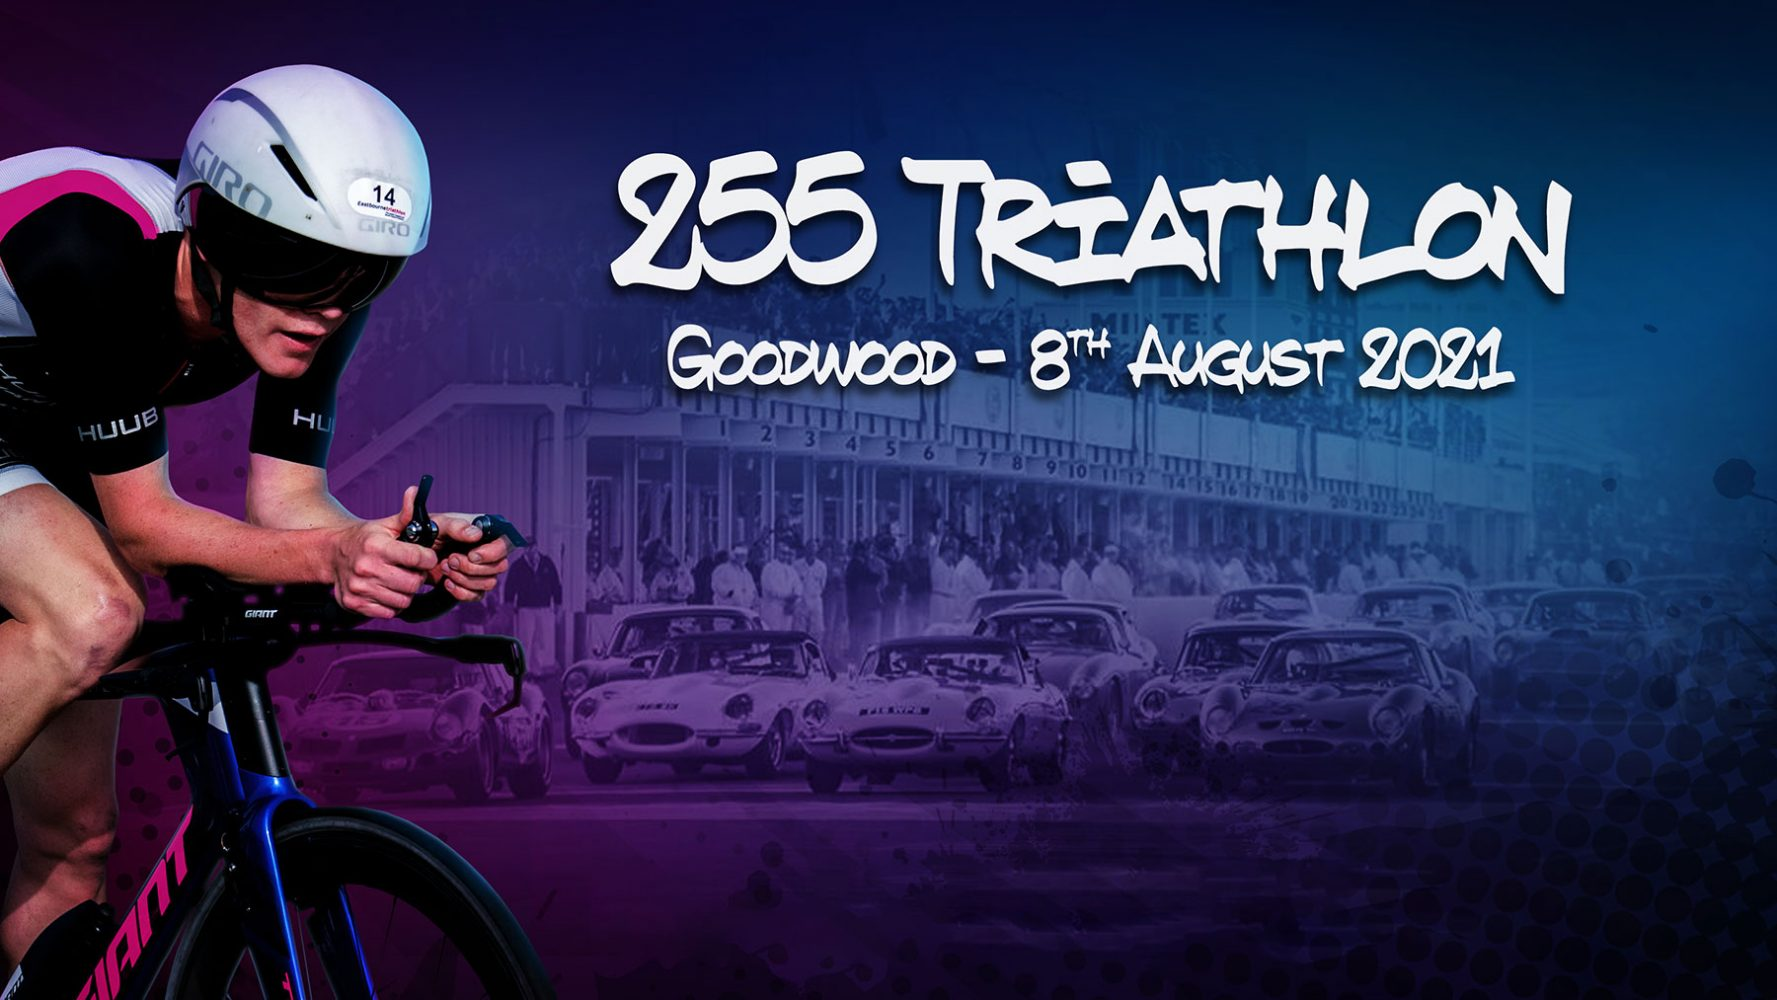 255 Triathlon